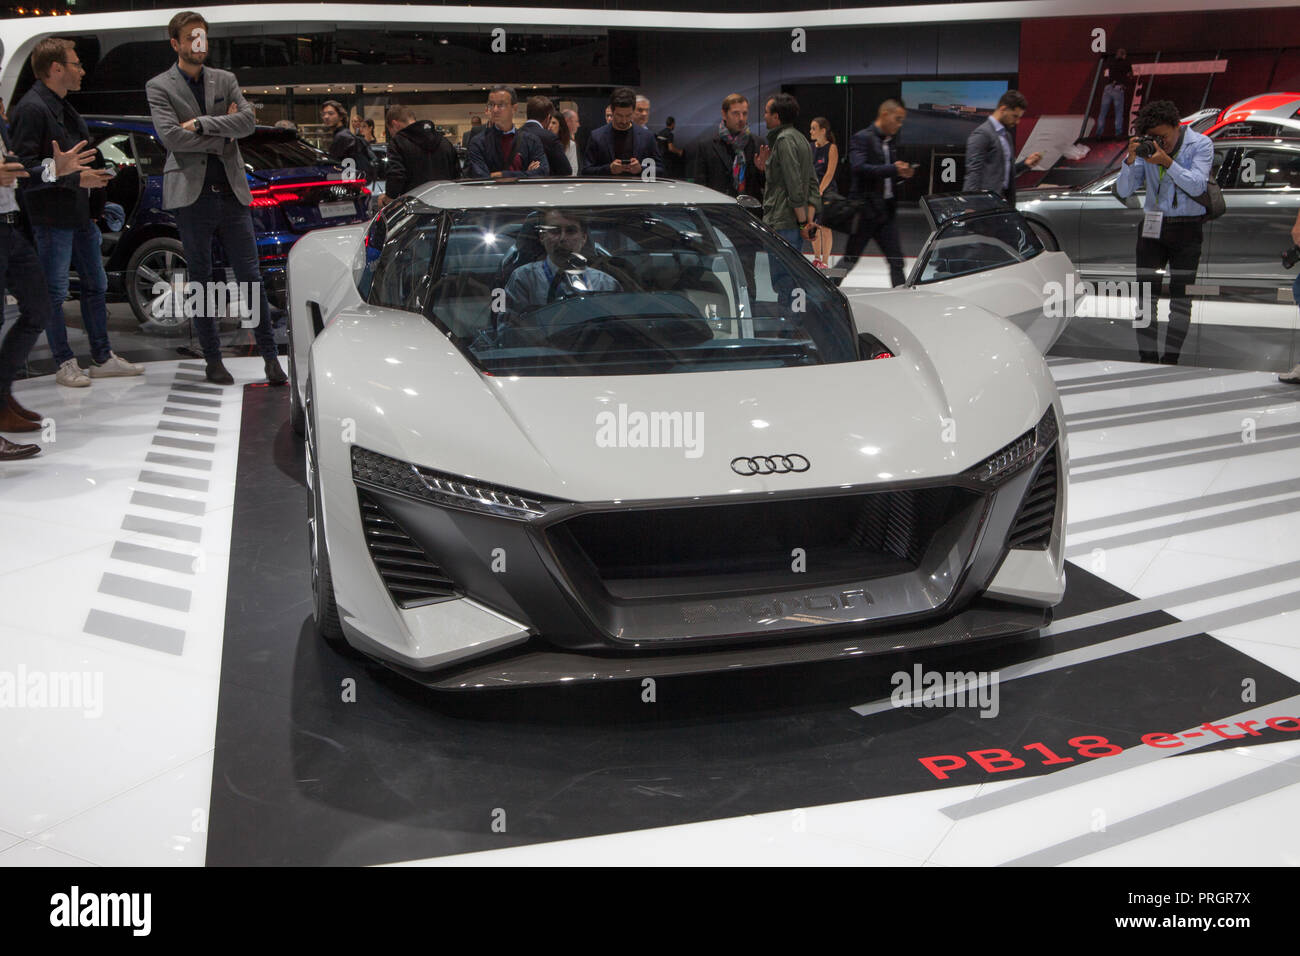 Mondial Paris motor show 2018 France - Stock Image